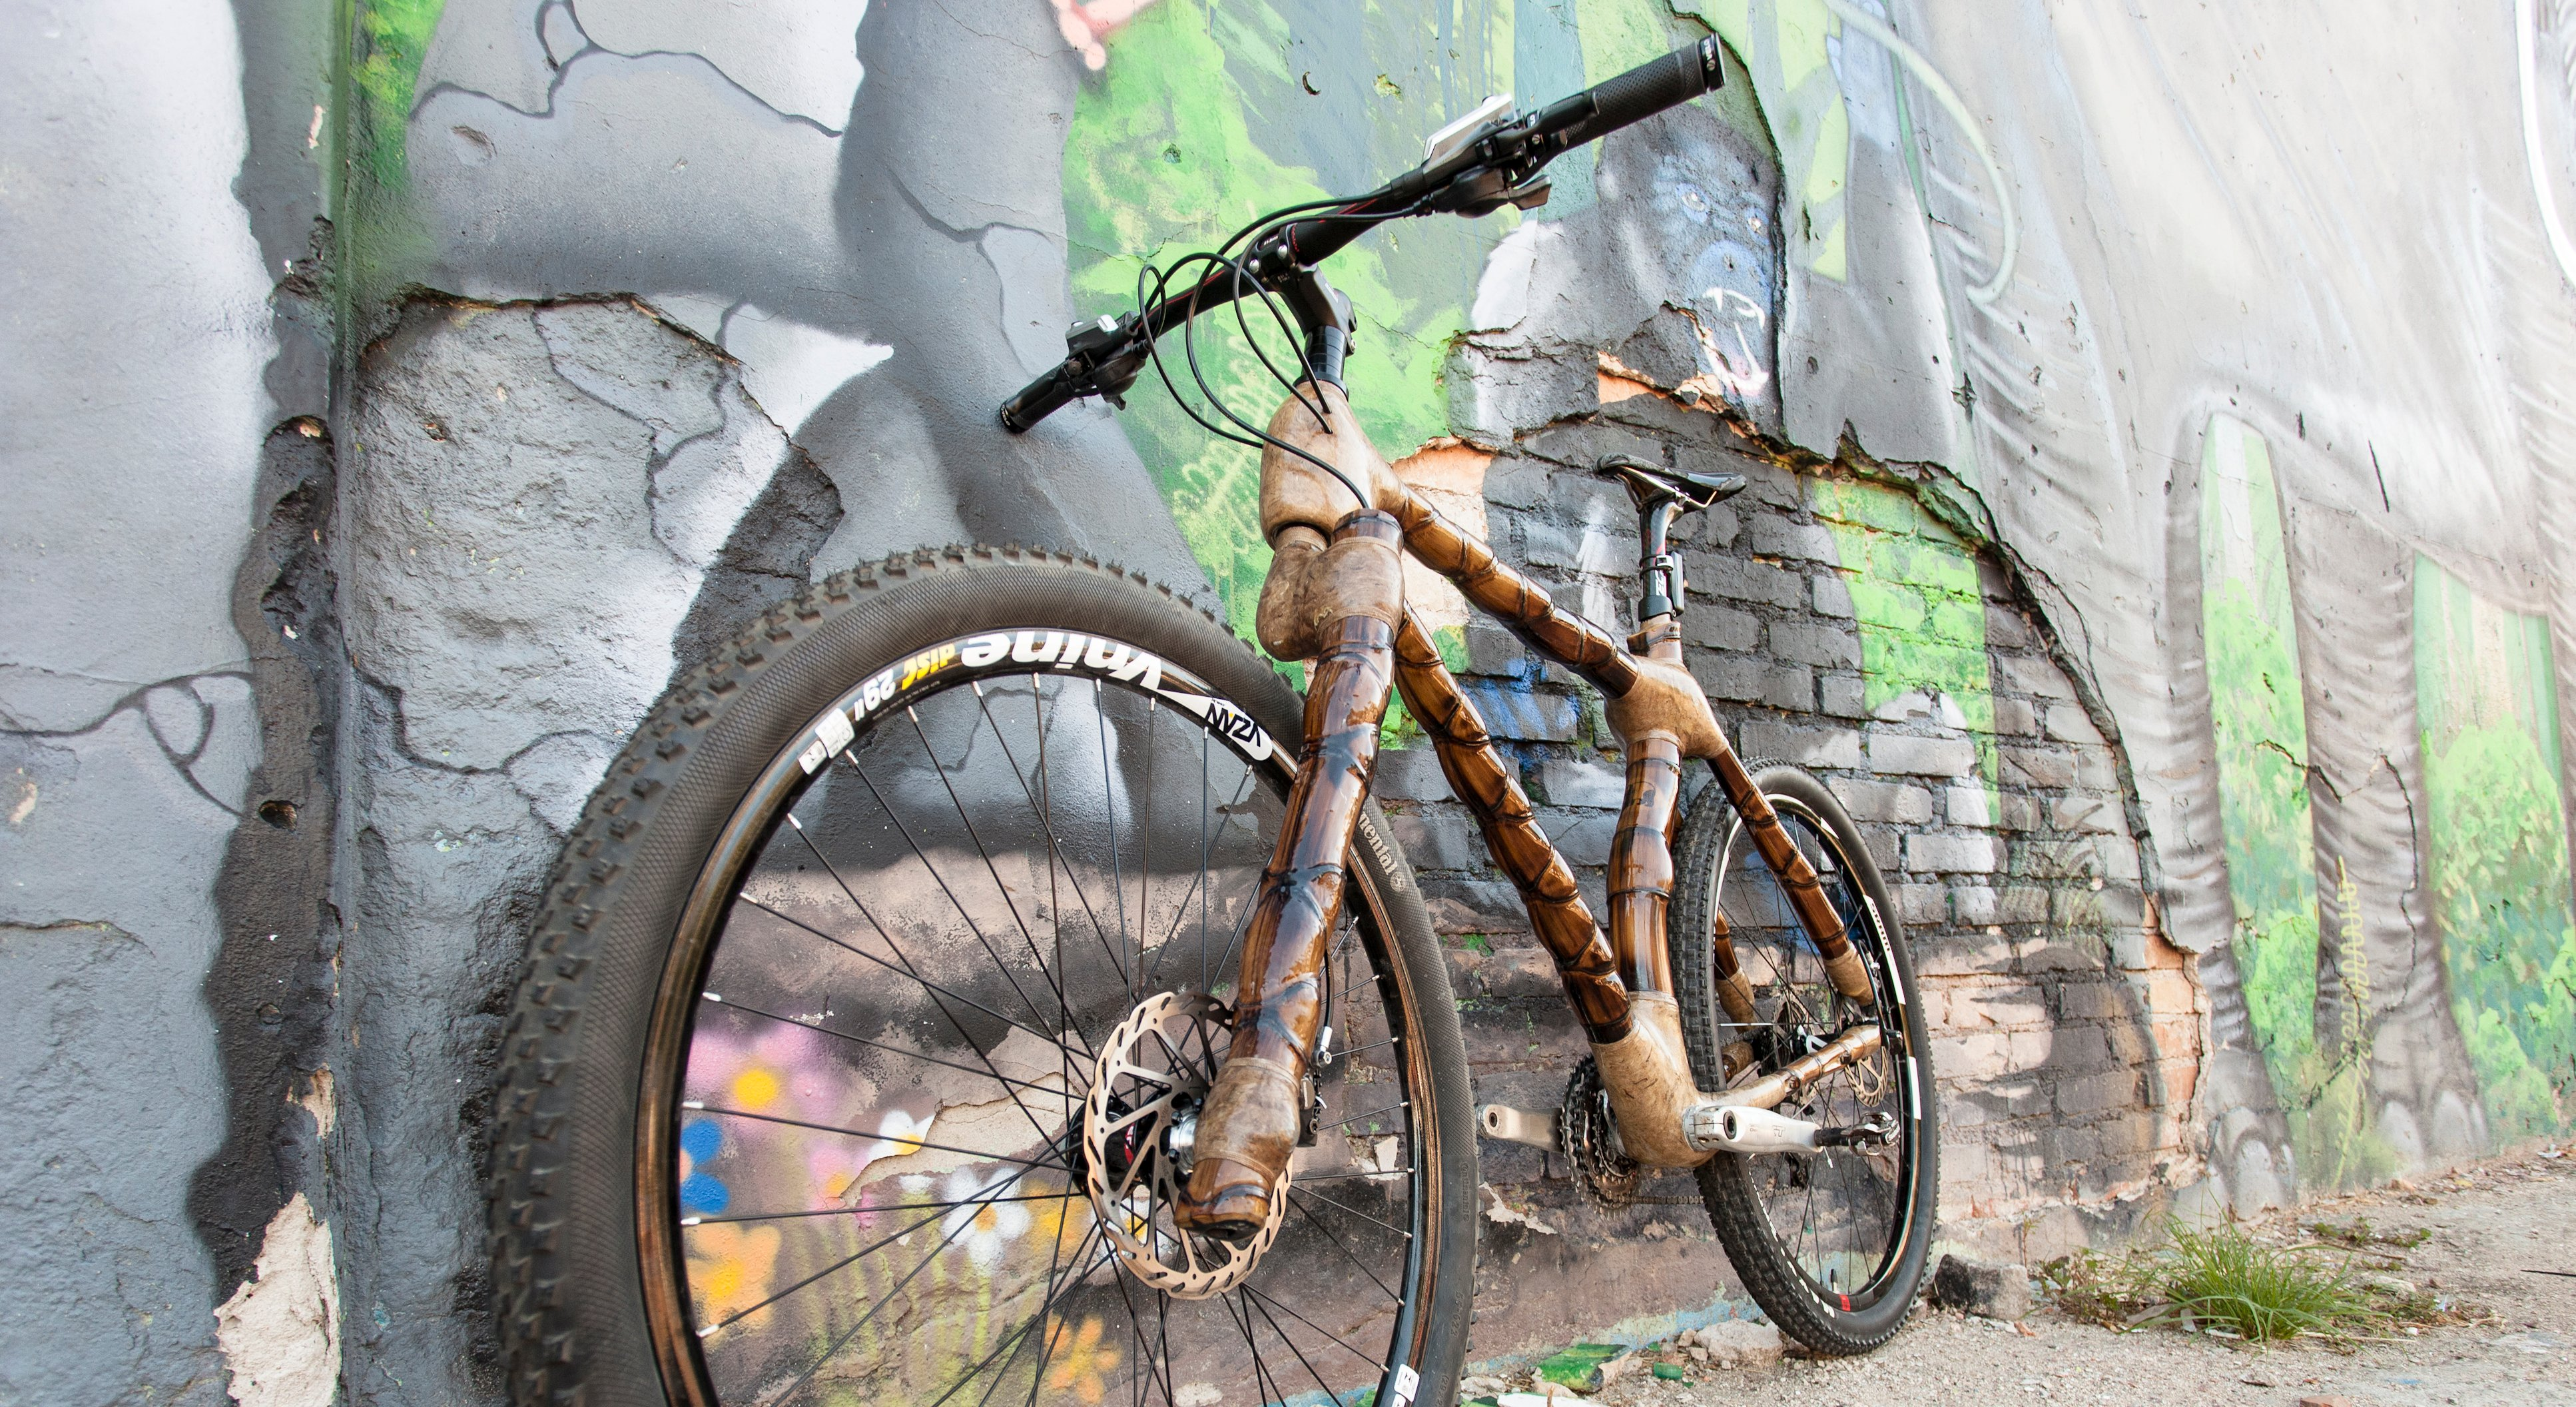 MTB 29er bamboo bike by ArtBikeBamboo, hand made, bicicleta mountain bike personalizada para trilhas